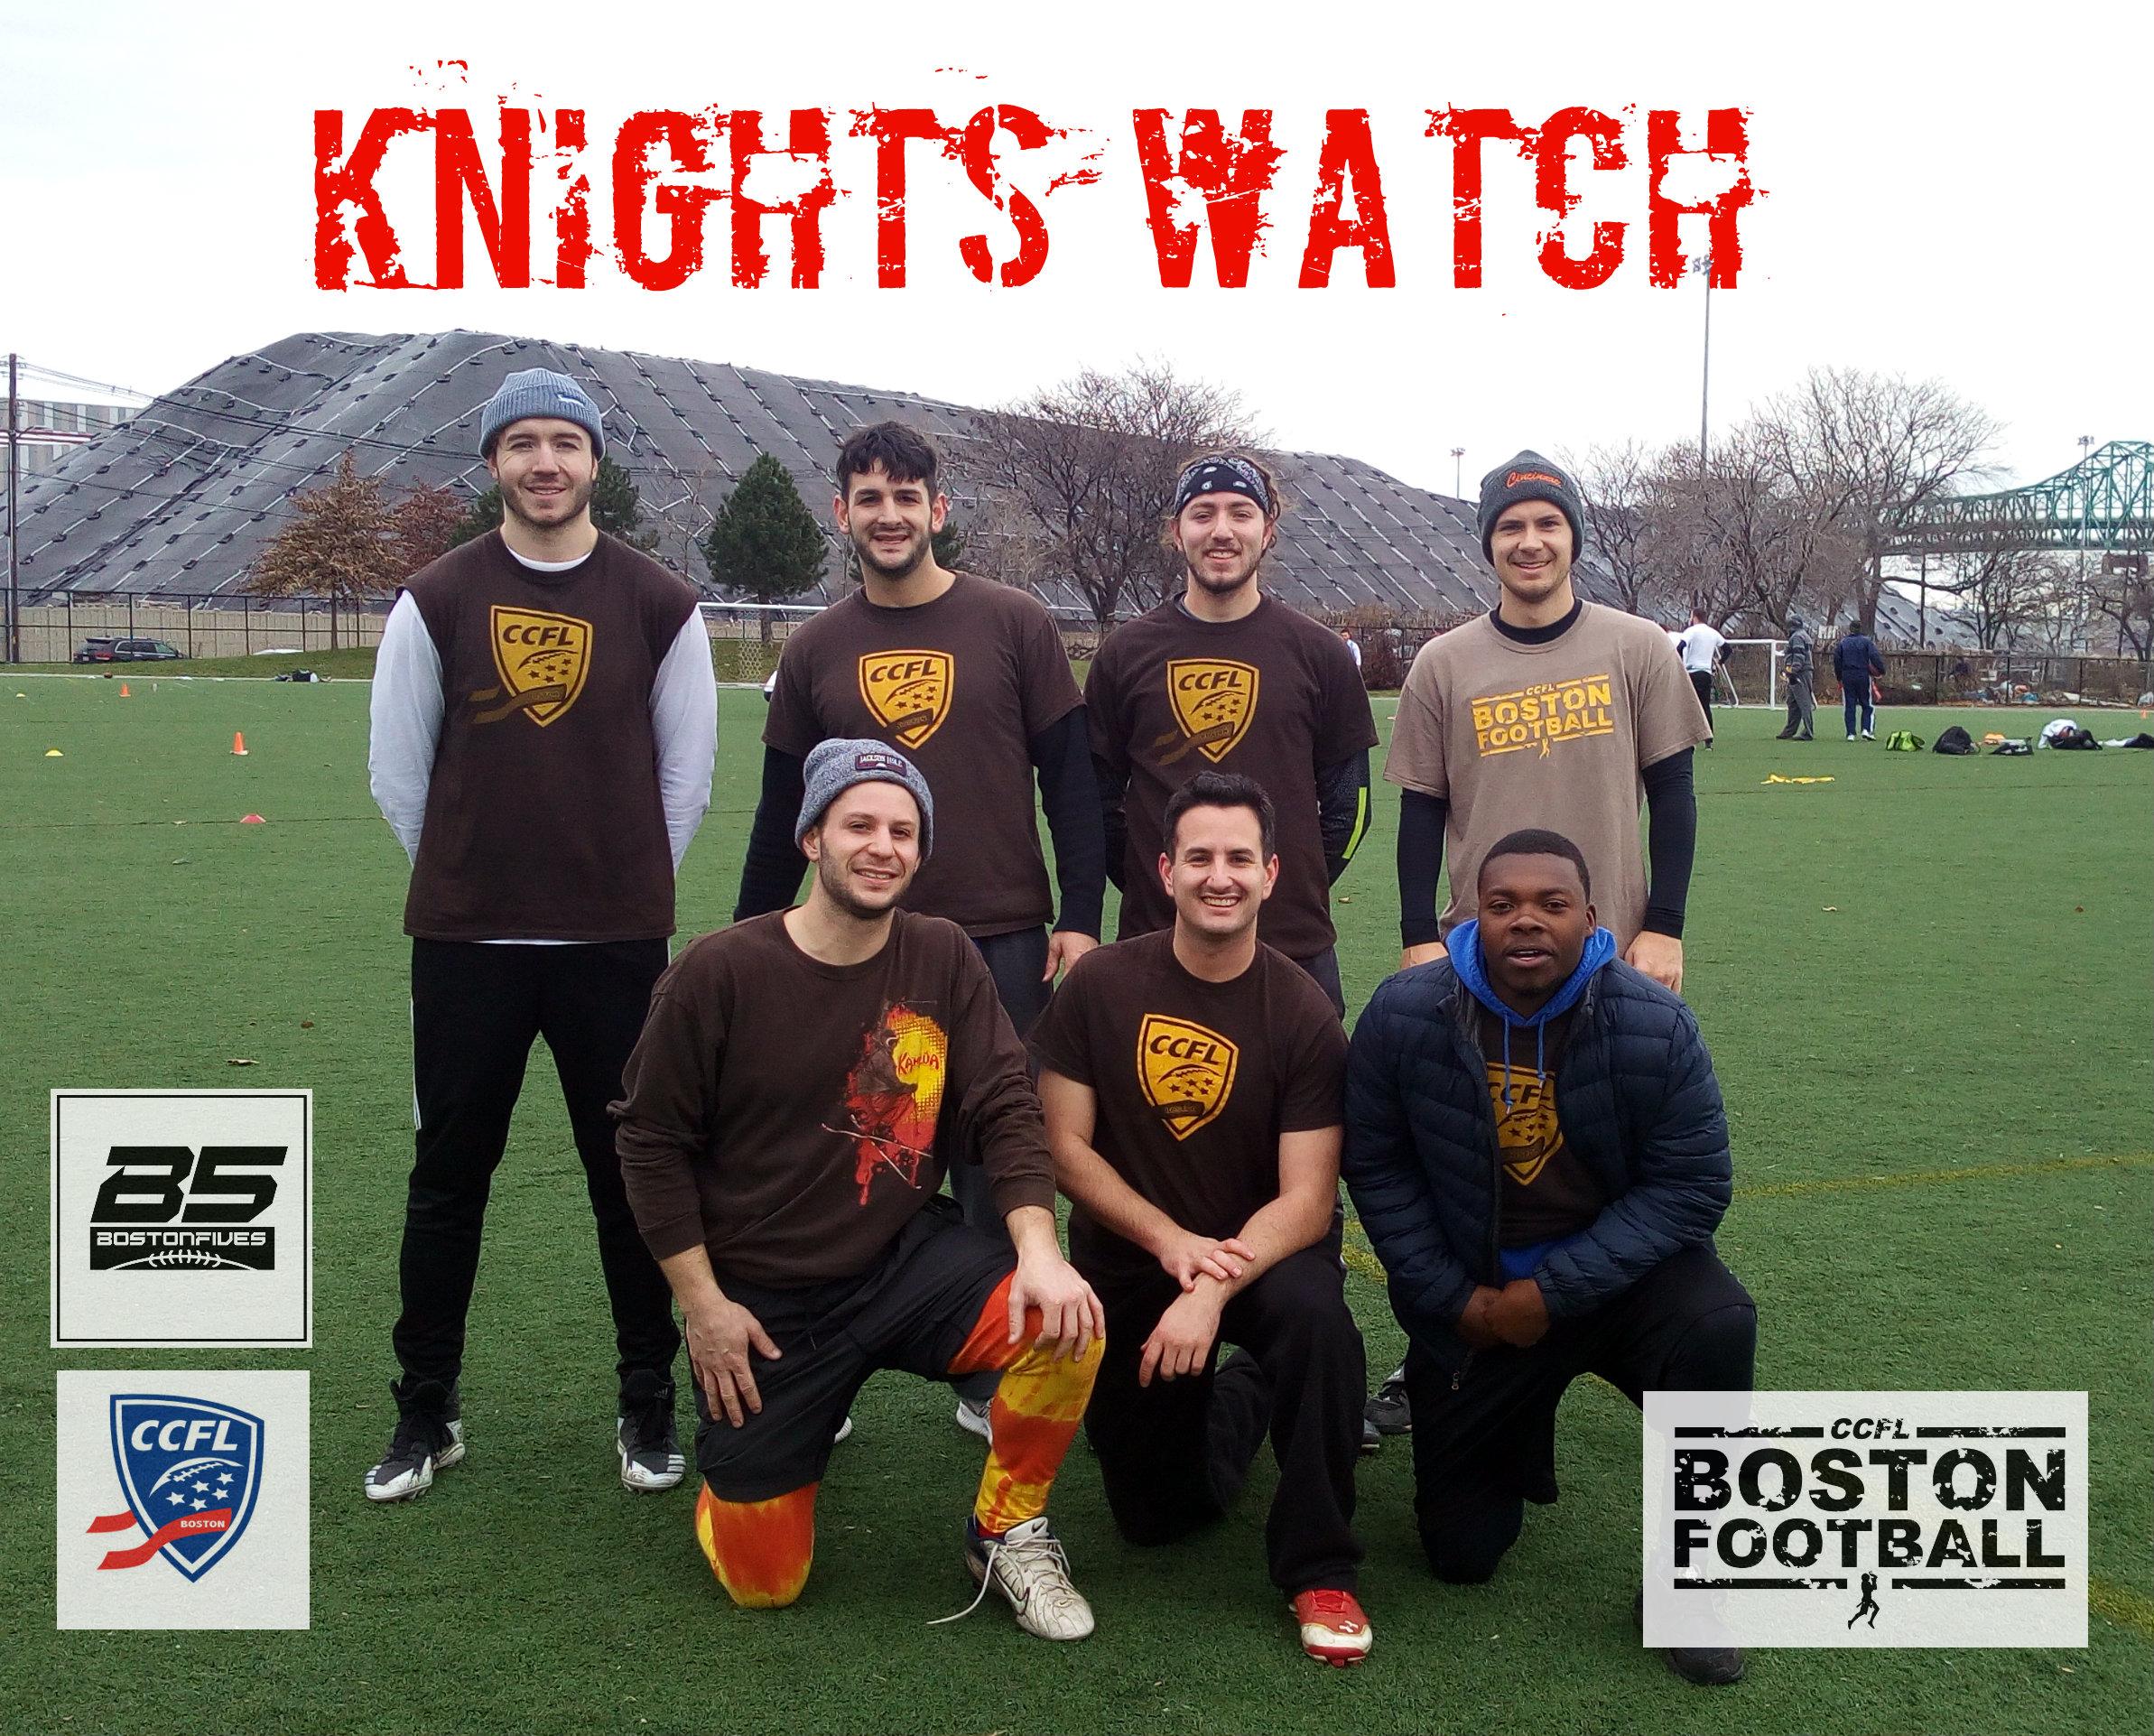 Knights Wathh